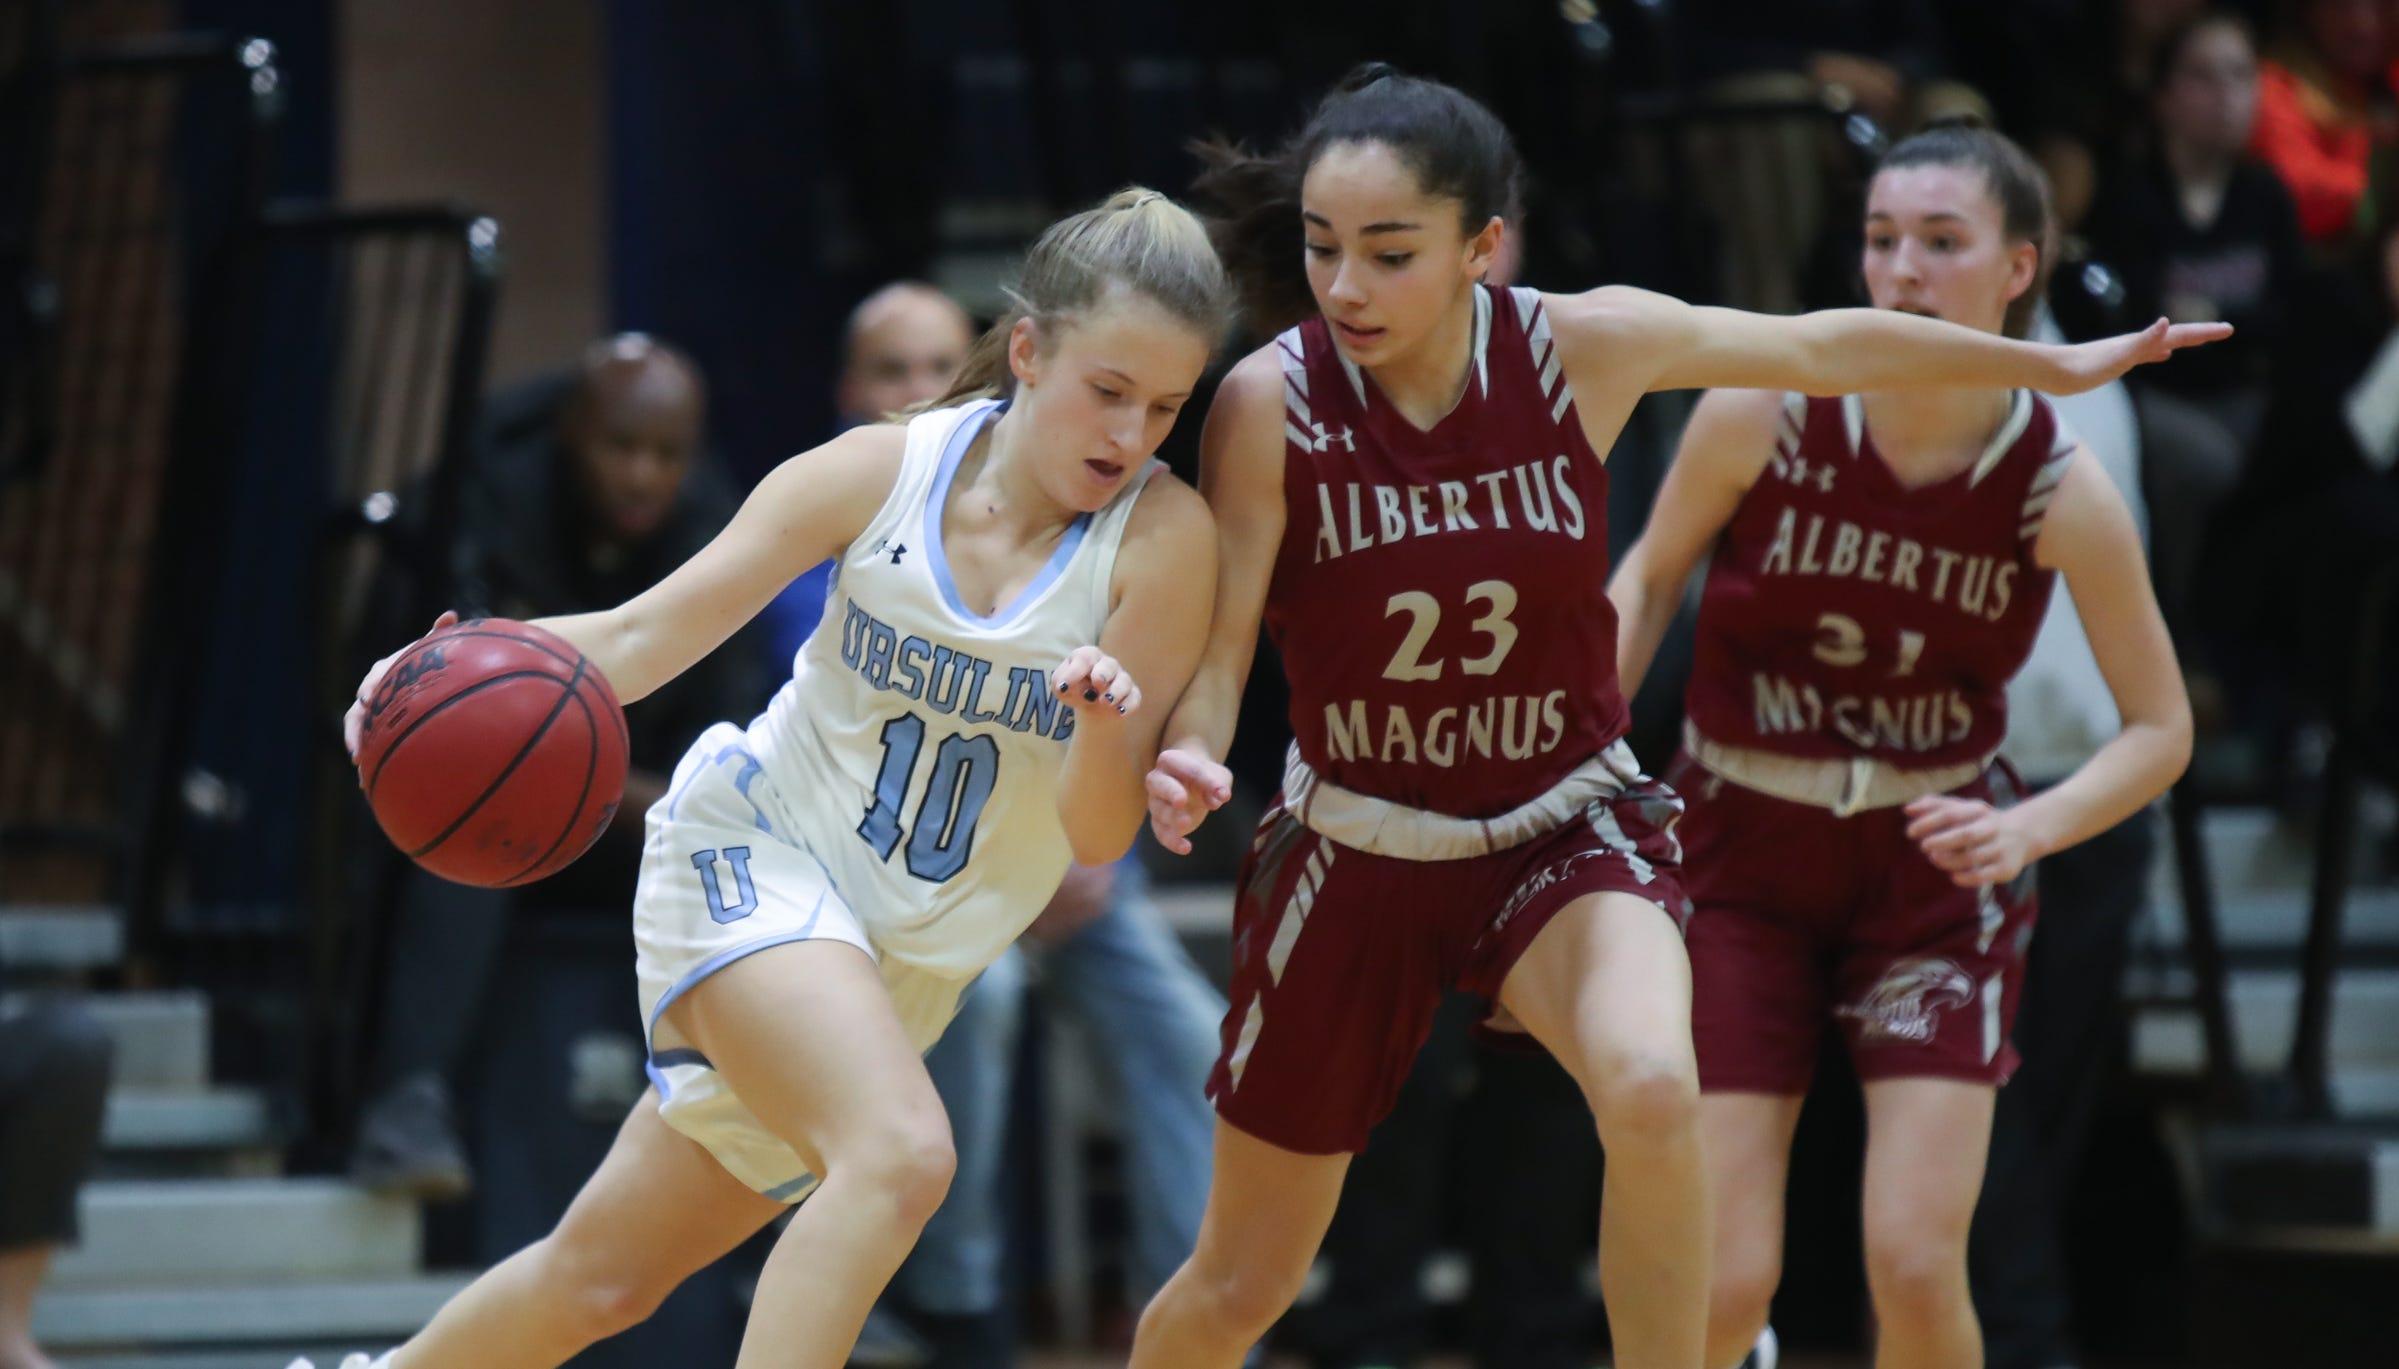 Ursuline's Alexa Mustafaj (10) drives on Albertus' Paulina Paris (23) during girls varsity basketball action at The Ursuline School in New Rochelle on Wednesday, January 9, 2019.  Ursuline defeated Albertus 68-48.